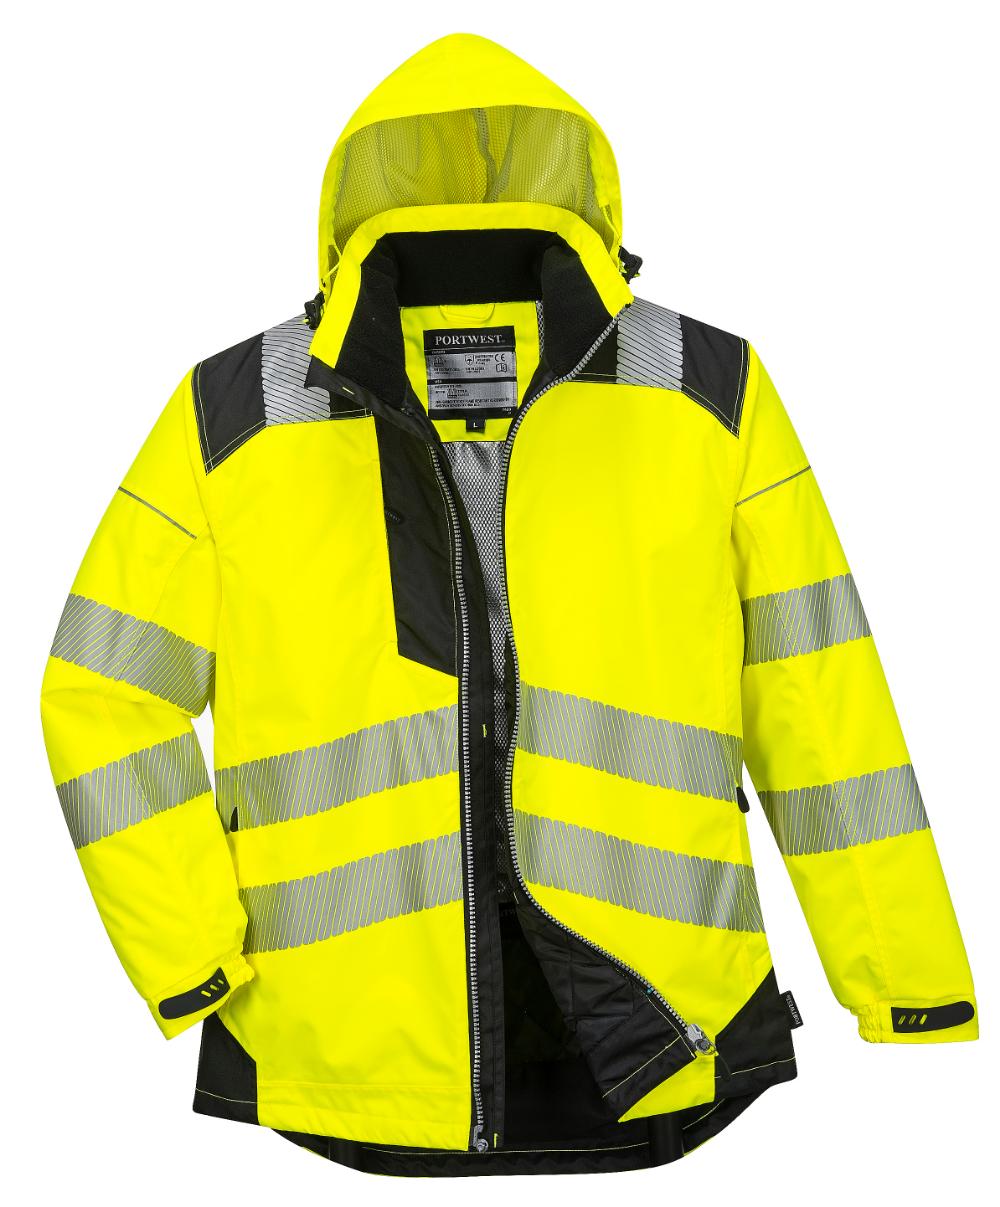 Portwest Vision Hi Vis Rain Jacket T400 Total Image Workingmans Big Tall Boots Carhartt Winchester Va Rain Jacket Jackets Waterproof Jacket